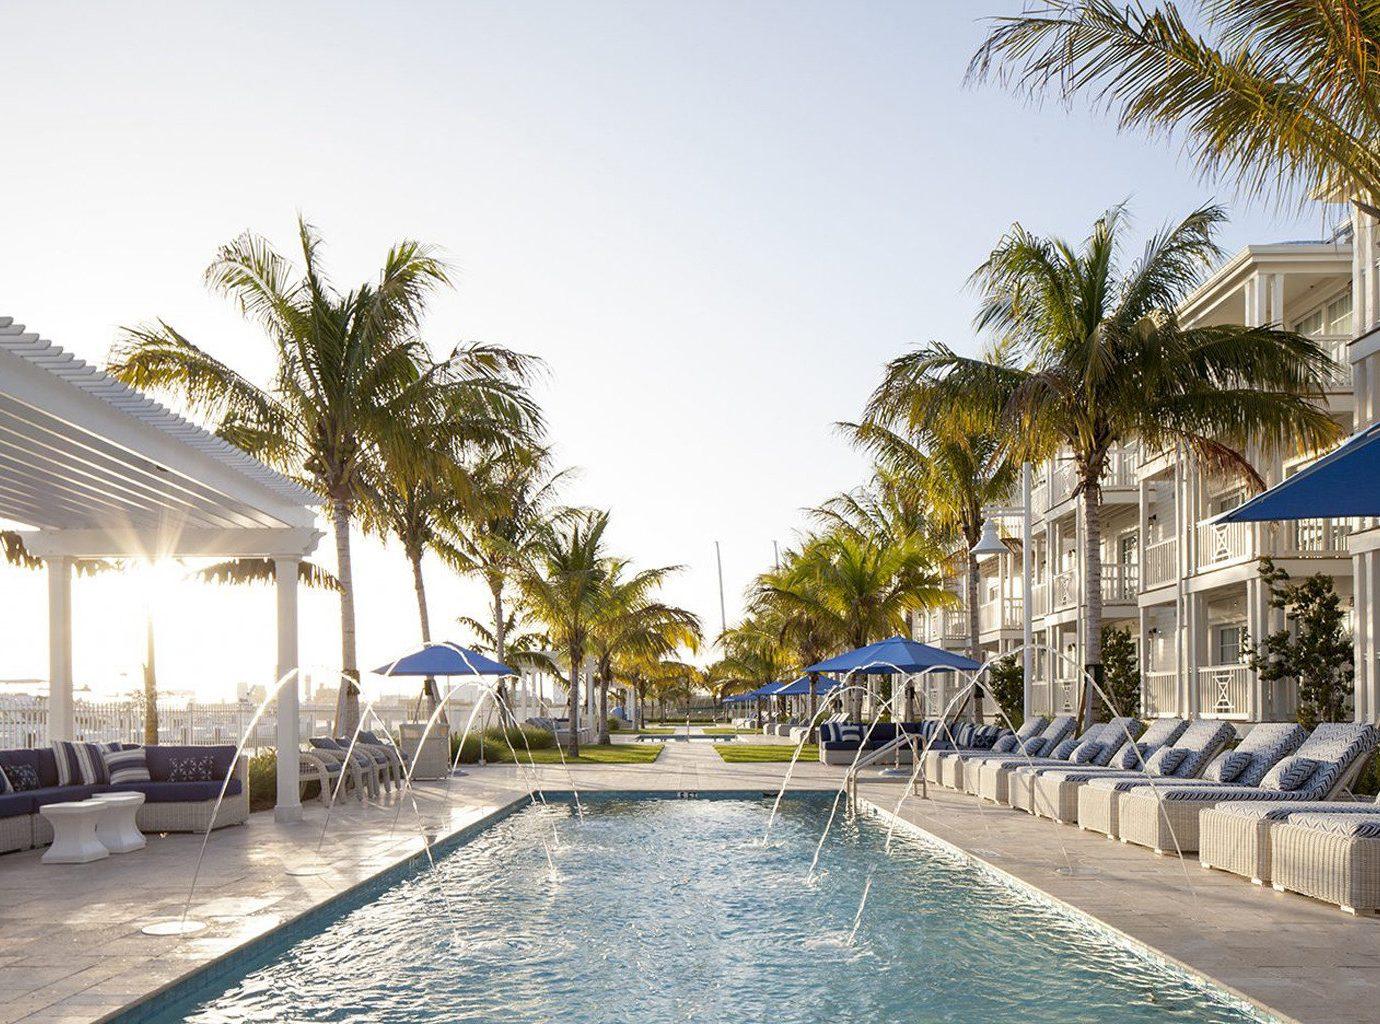 Florida Hotels Trip Ideas outdoor tree building vacation swimming pool Resort walkway estate Beach condominium arecales marina plaza dock boardwalk Sea lined